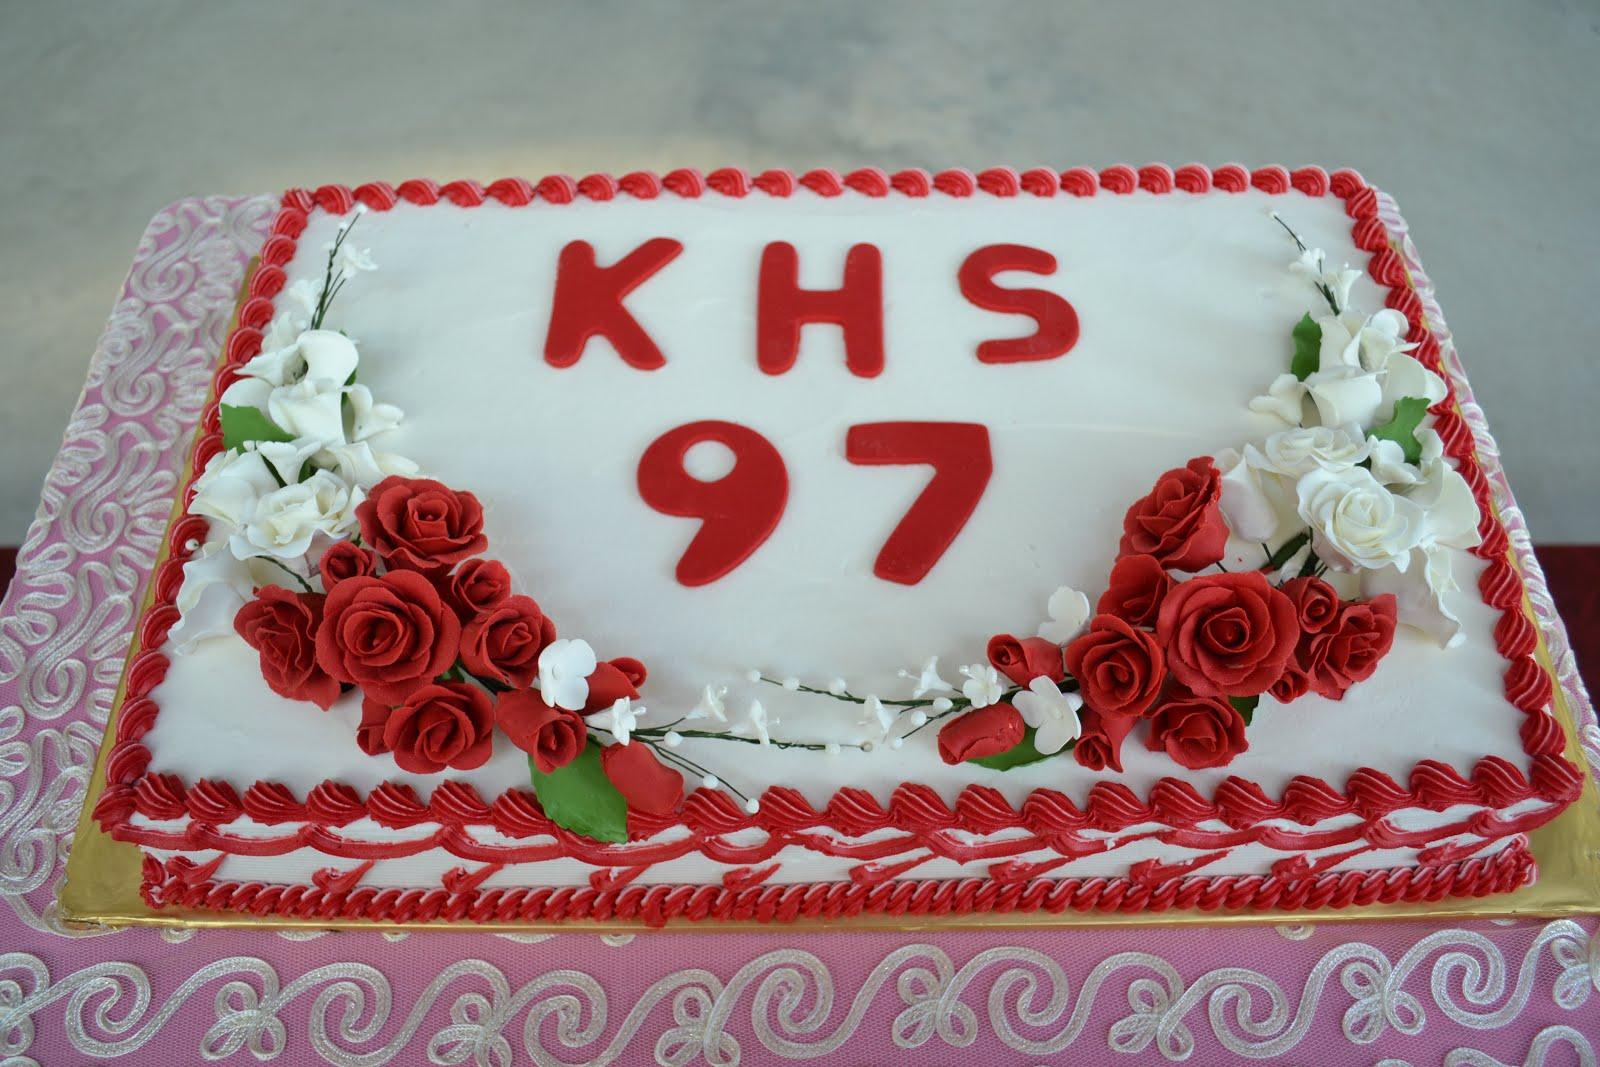 KHS-97